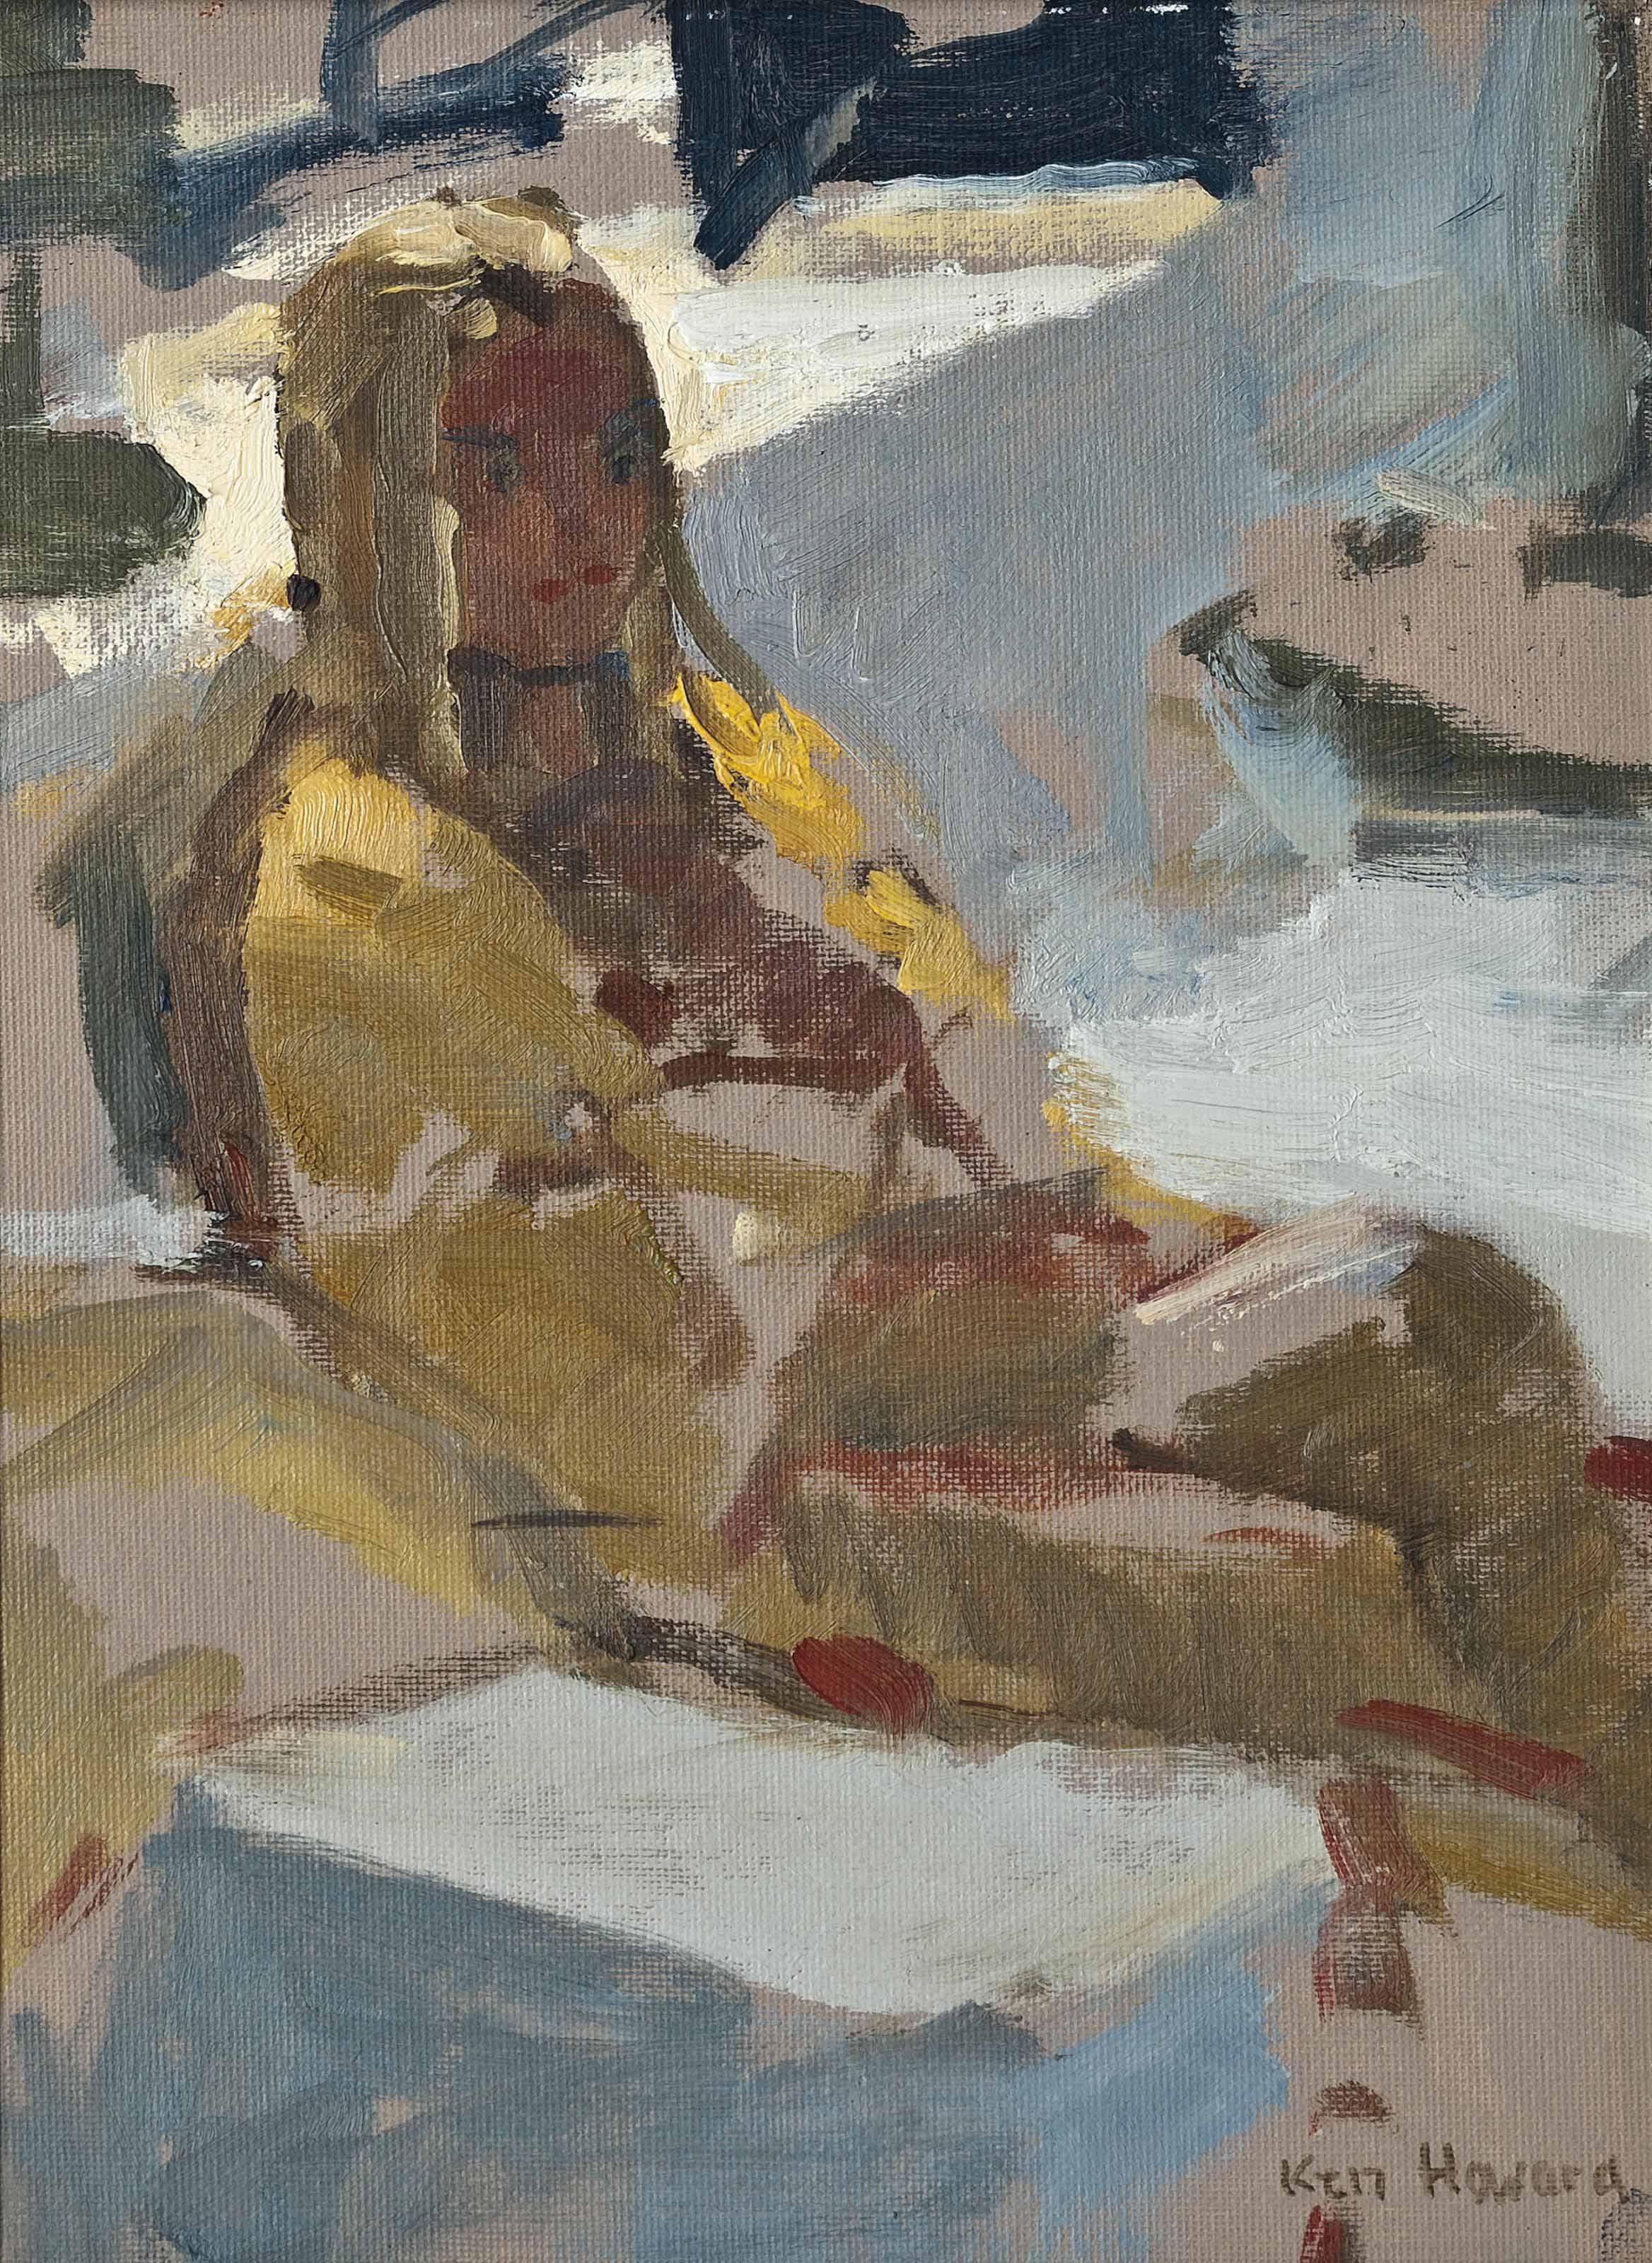 Ken Howard, R.A. (b. 1932)